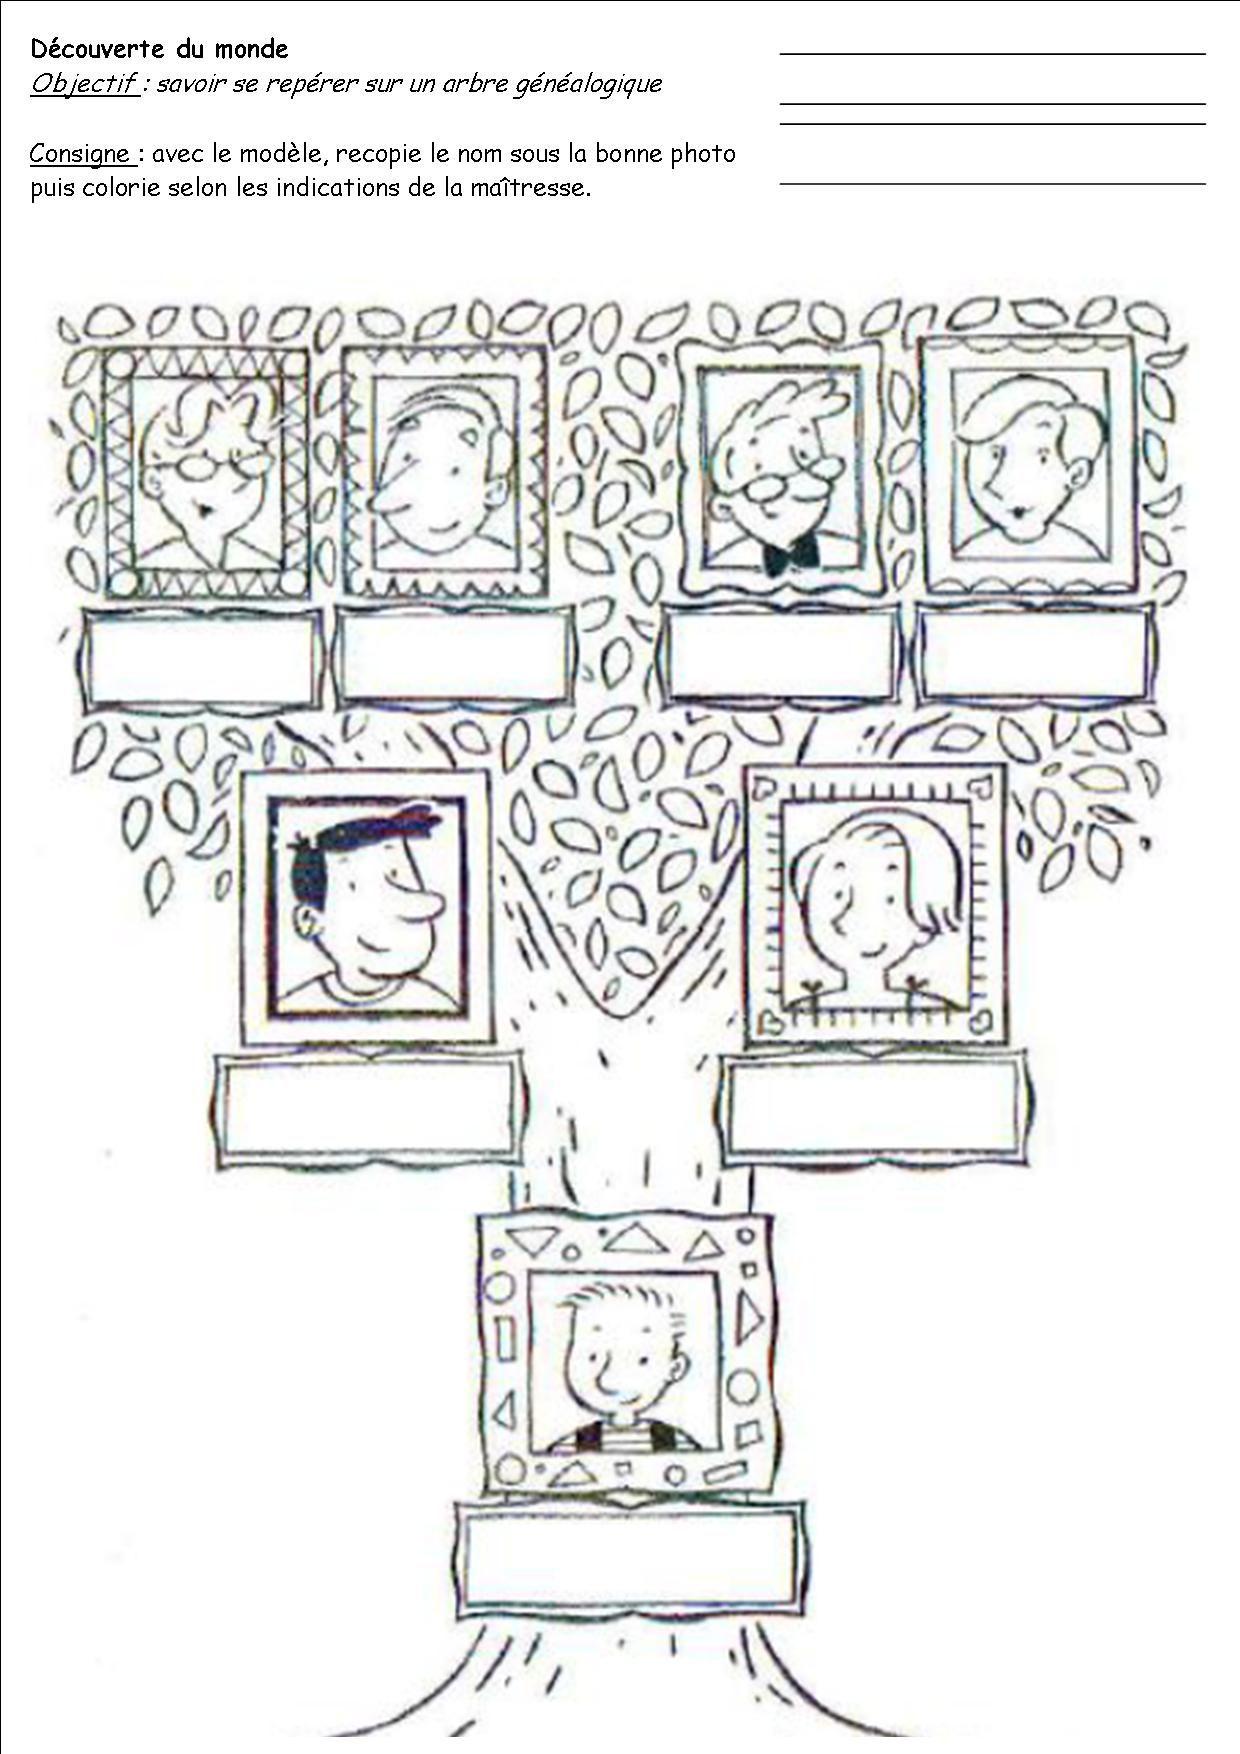 Coloriage Arbre Genealogique.Elegant Dessin Arbre Genealogique Gratuit Imprimer